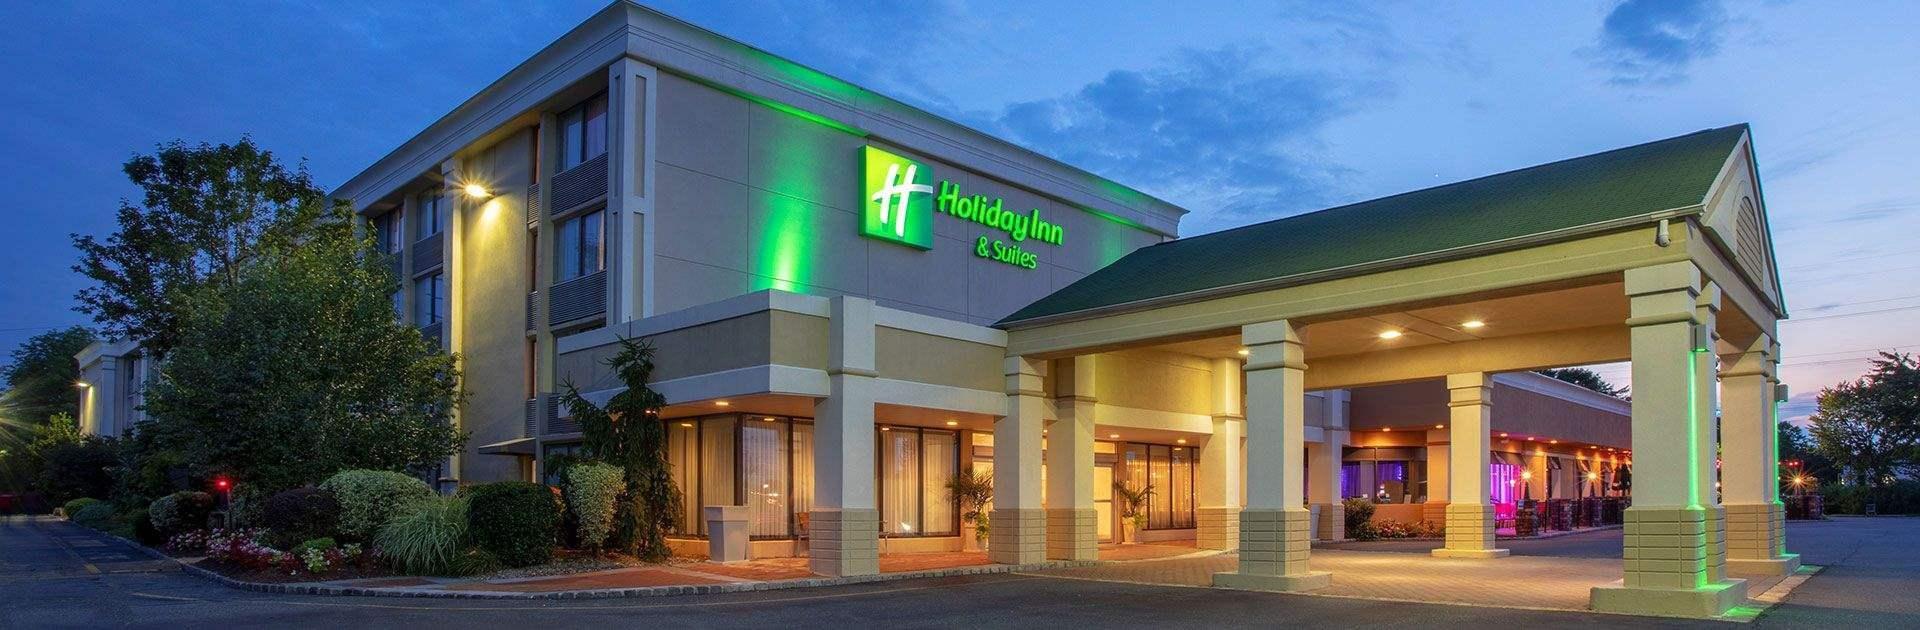 Holiday Inn & Suites Parsippany Fairfield